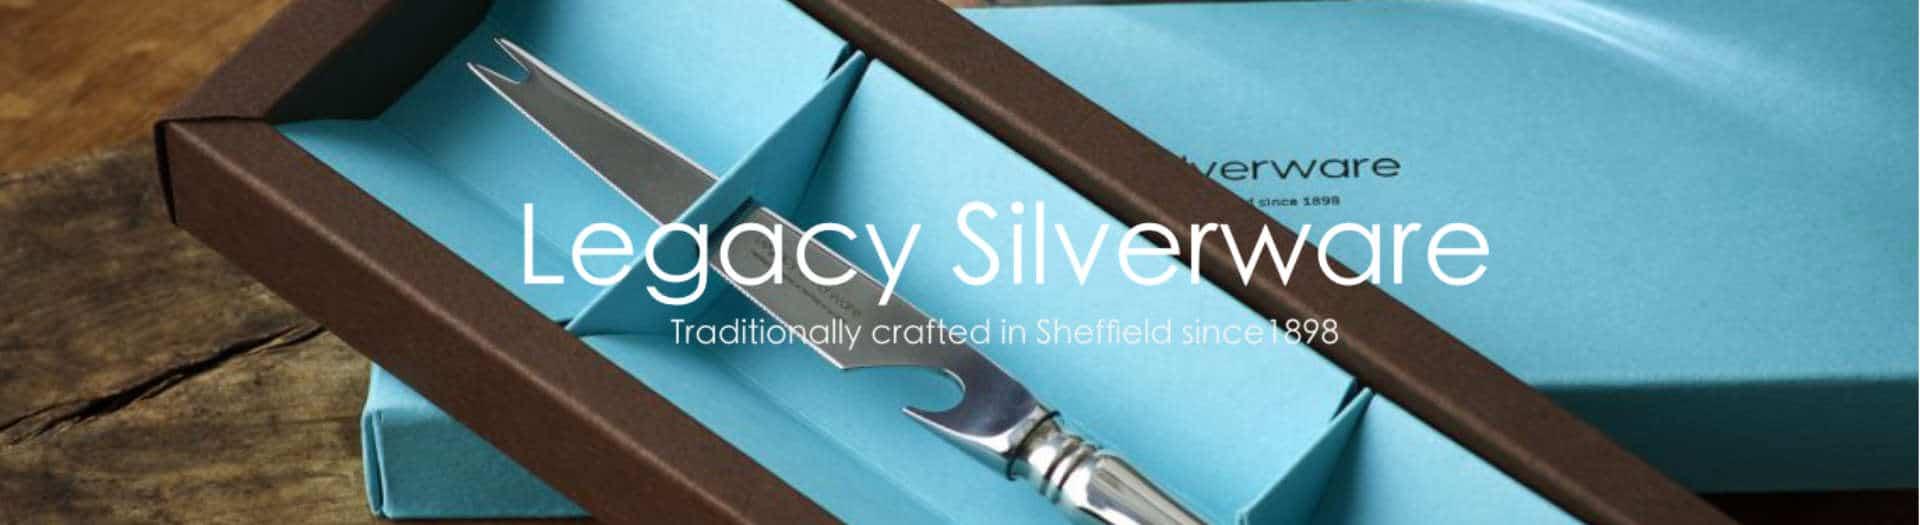 legacy silverware made in sheffield silver cutlery gift